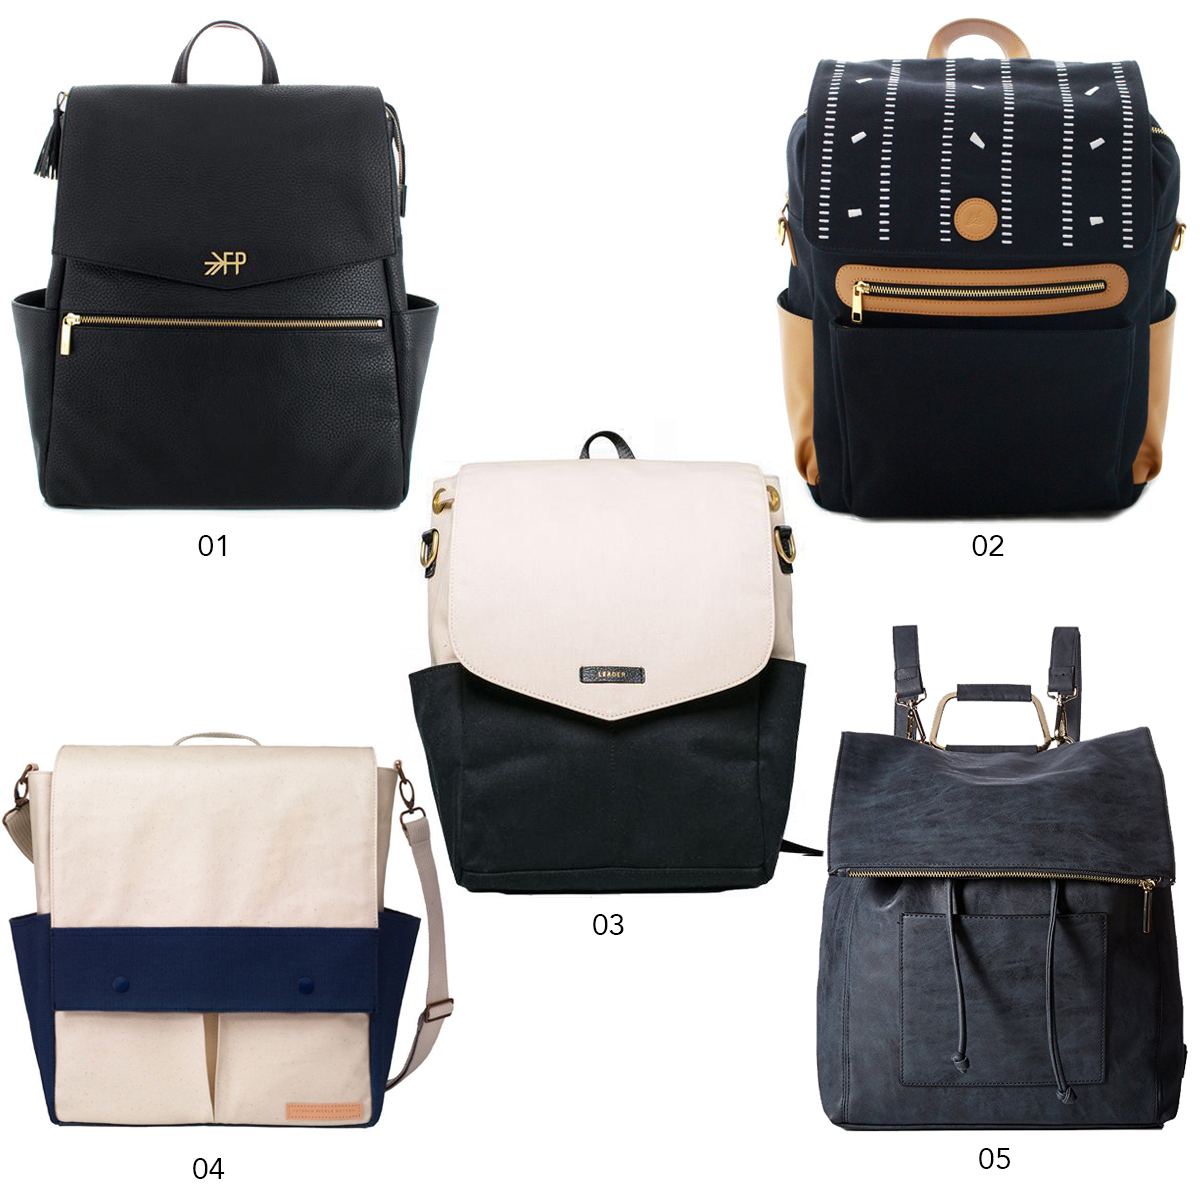 Ten Seriously Stylish Diaper Backpacks | Design Confetti